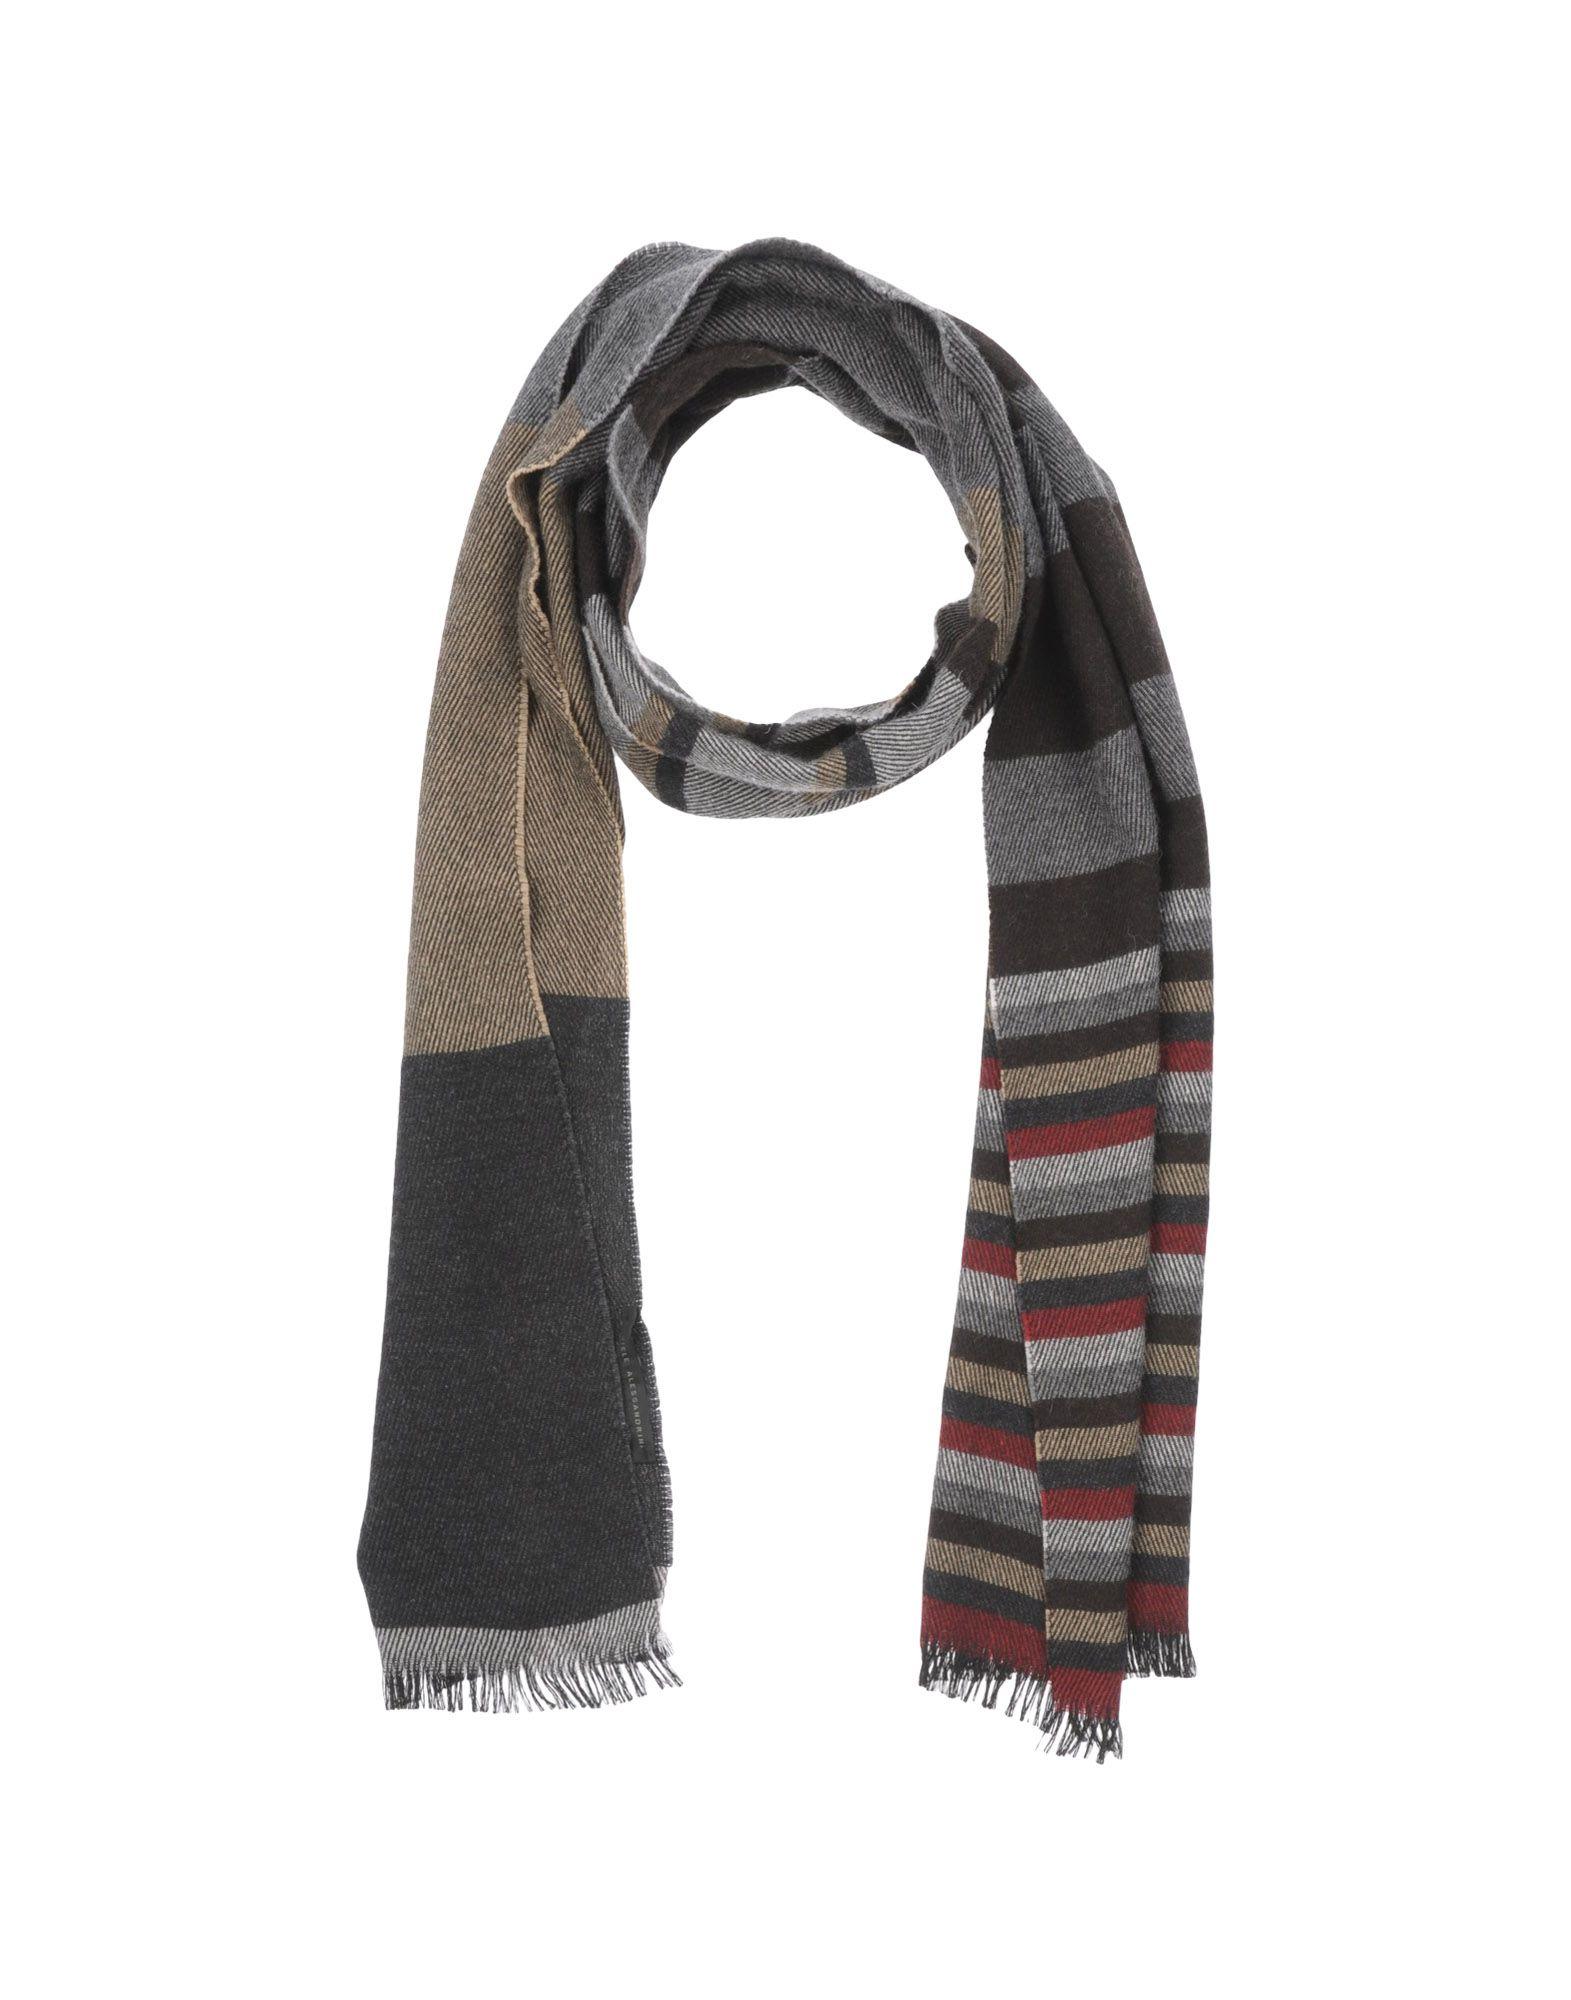 ACCESSORIES - Oblong scarves Daniele Alessandrini 3MJv6faob